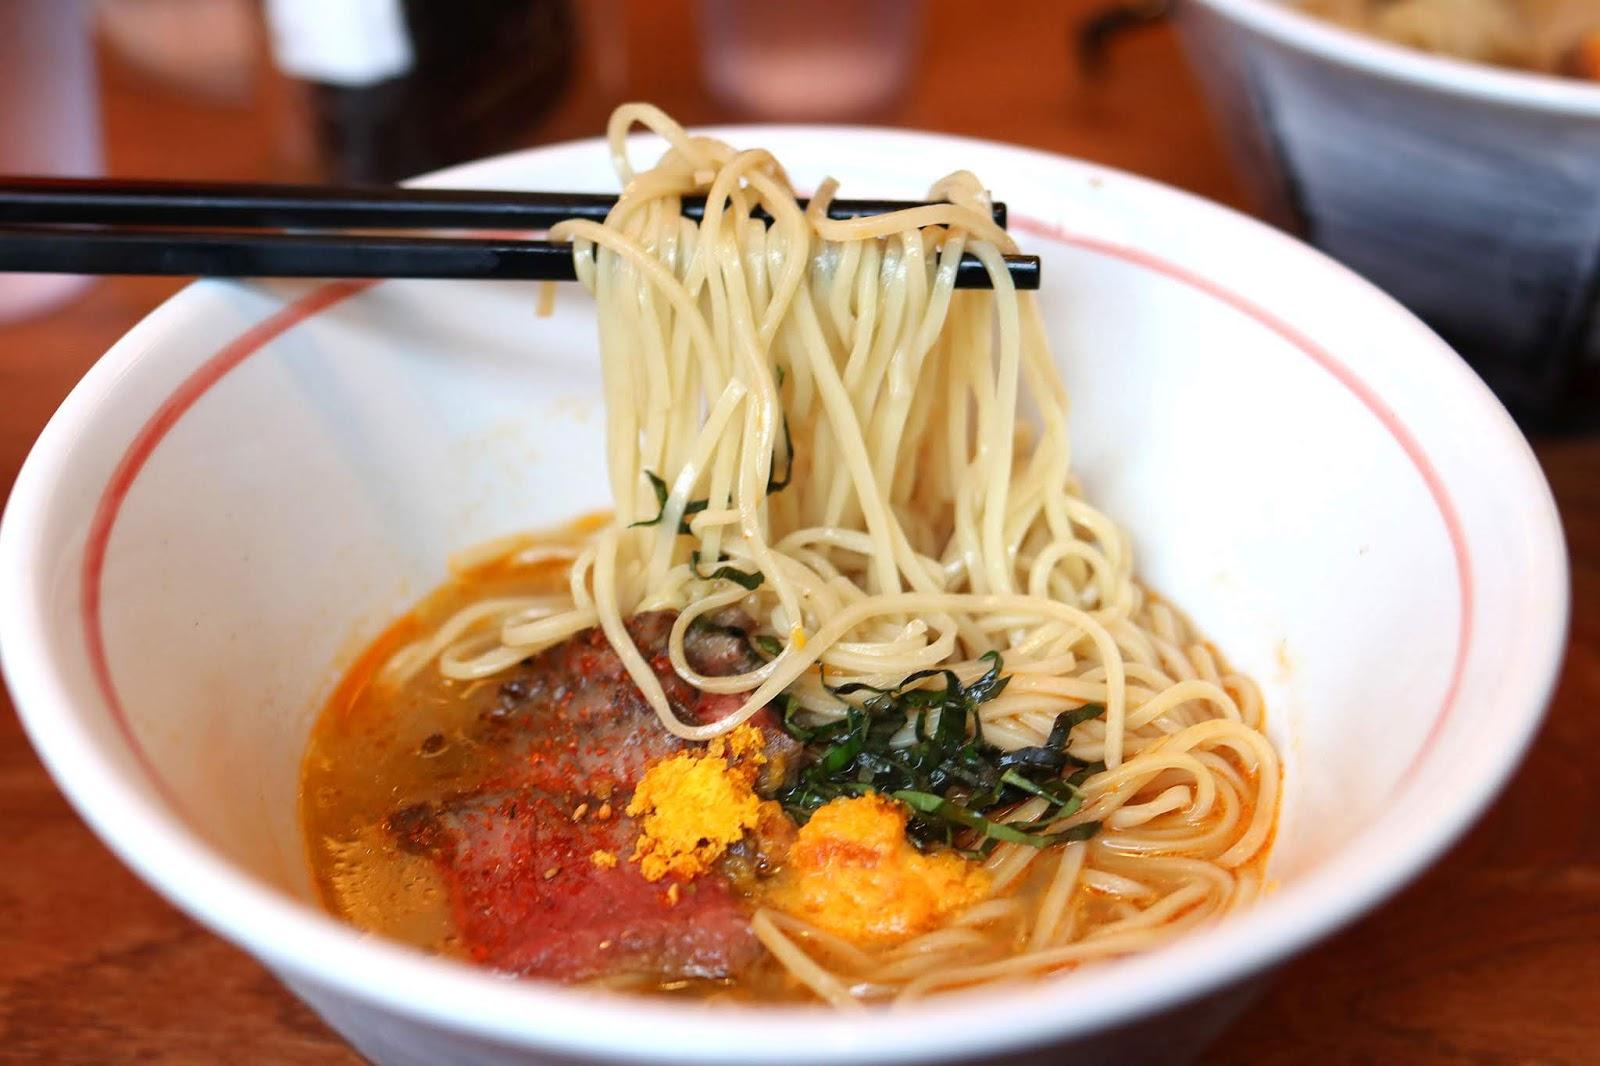 Chicago Eats: Omakase Dinner at Strings Ramen